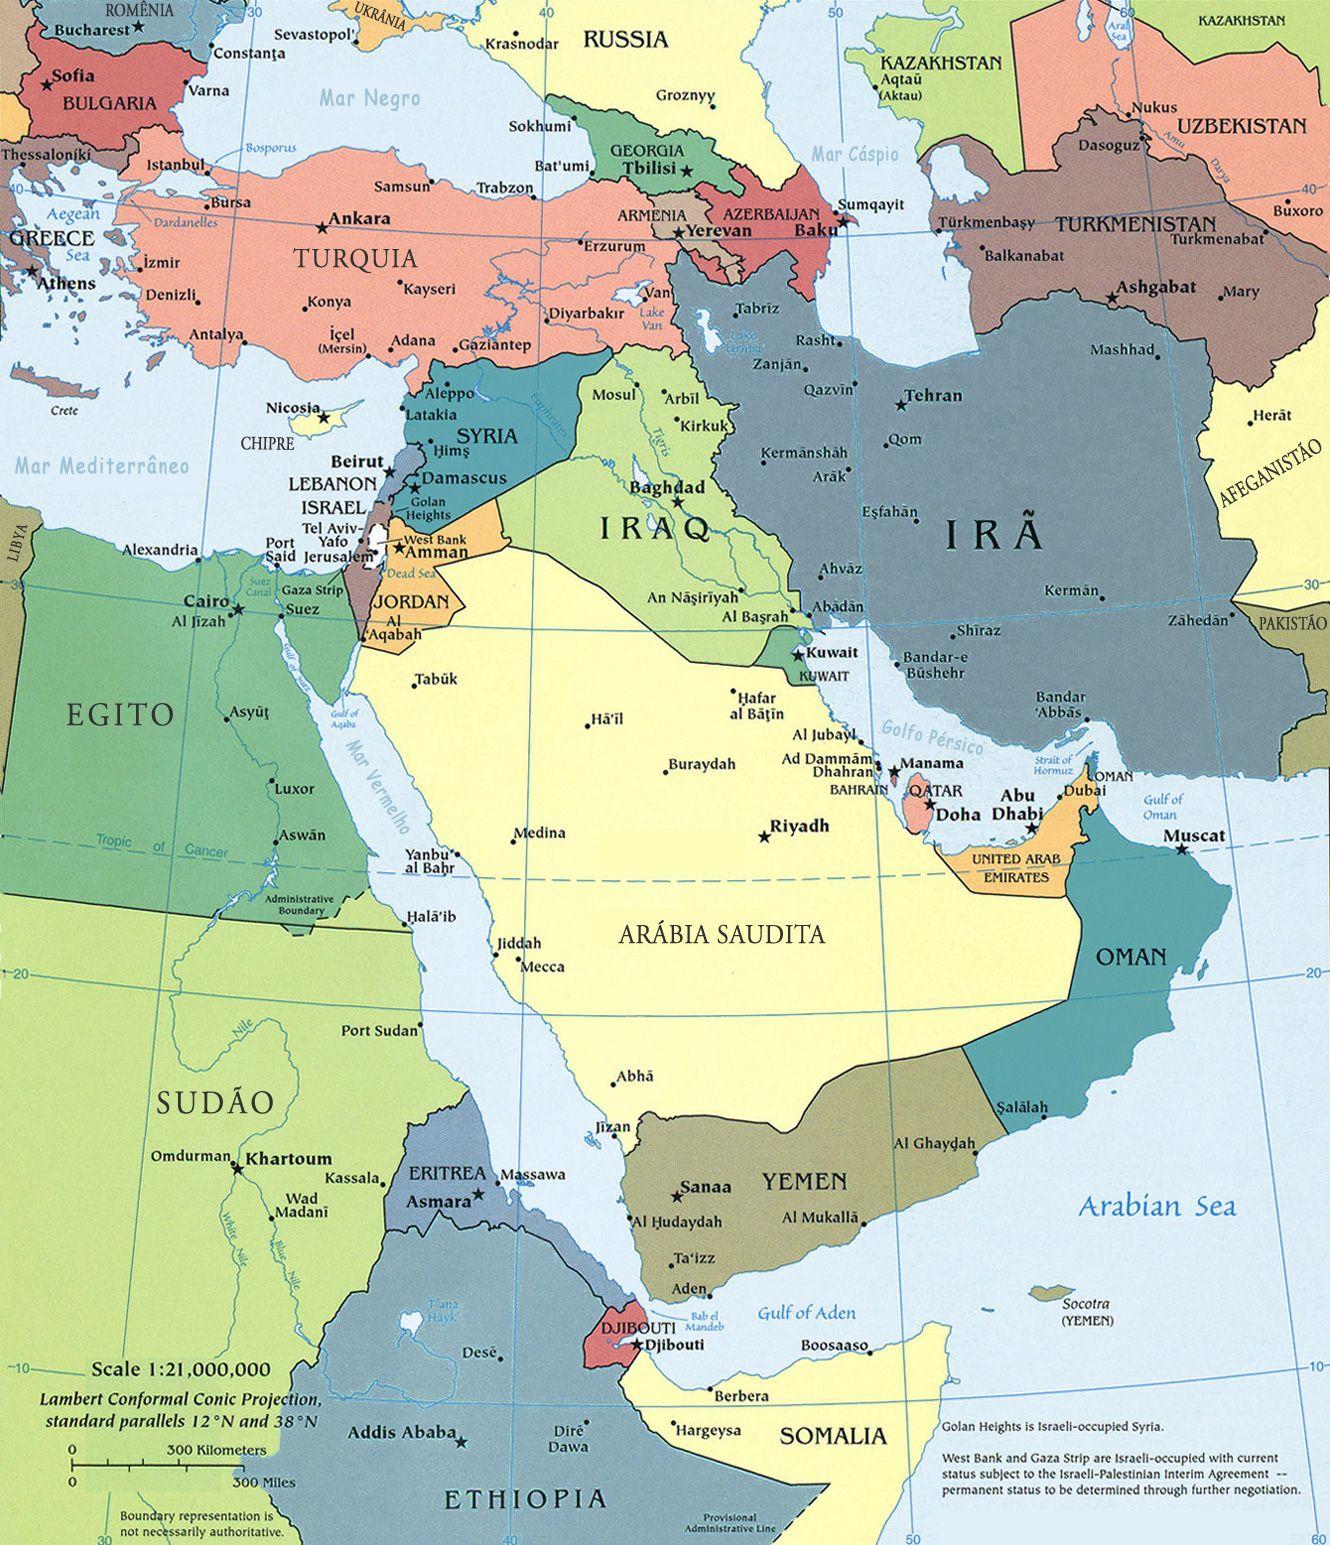 MAPA politico Grande de America europa asi africa oceania online – Mapa De Iraq